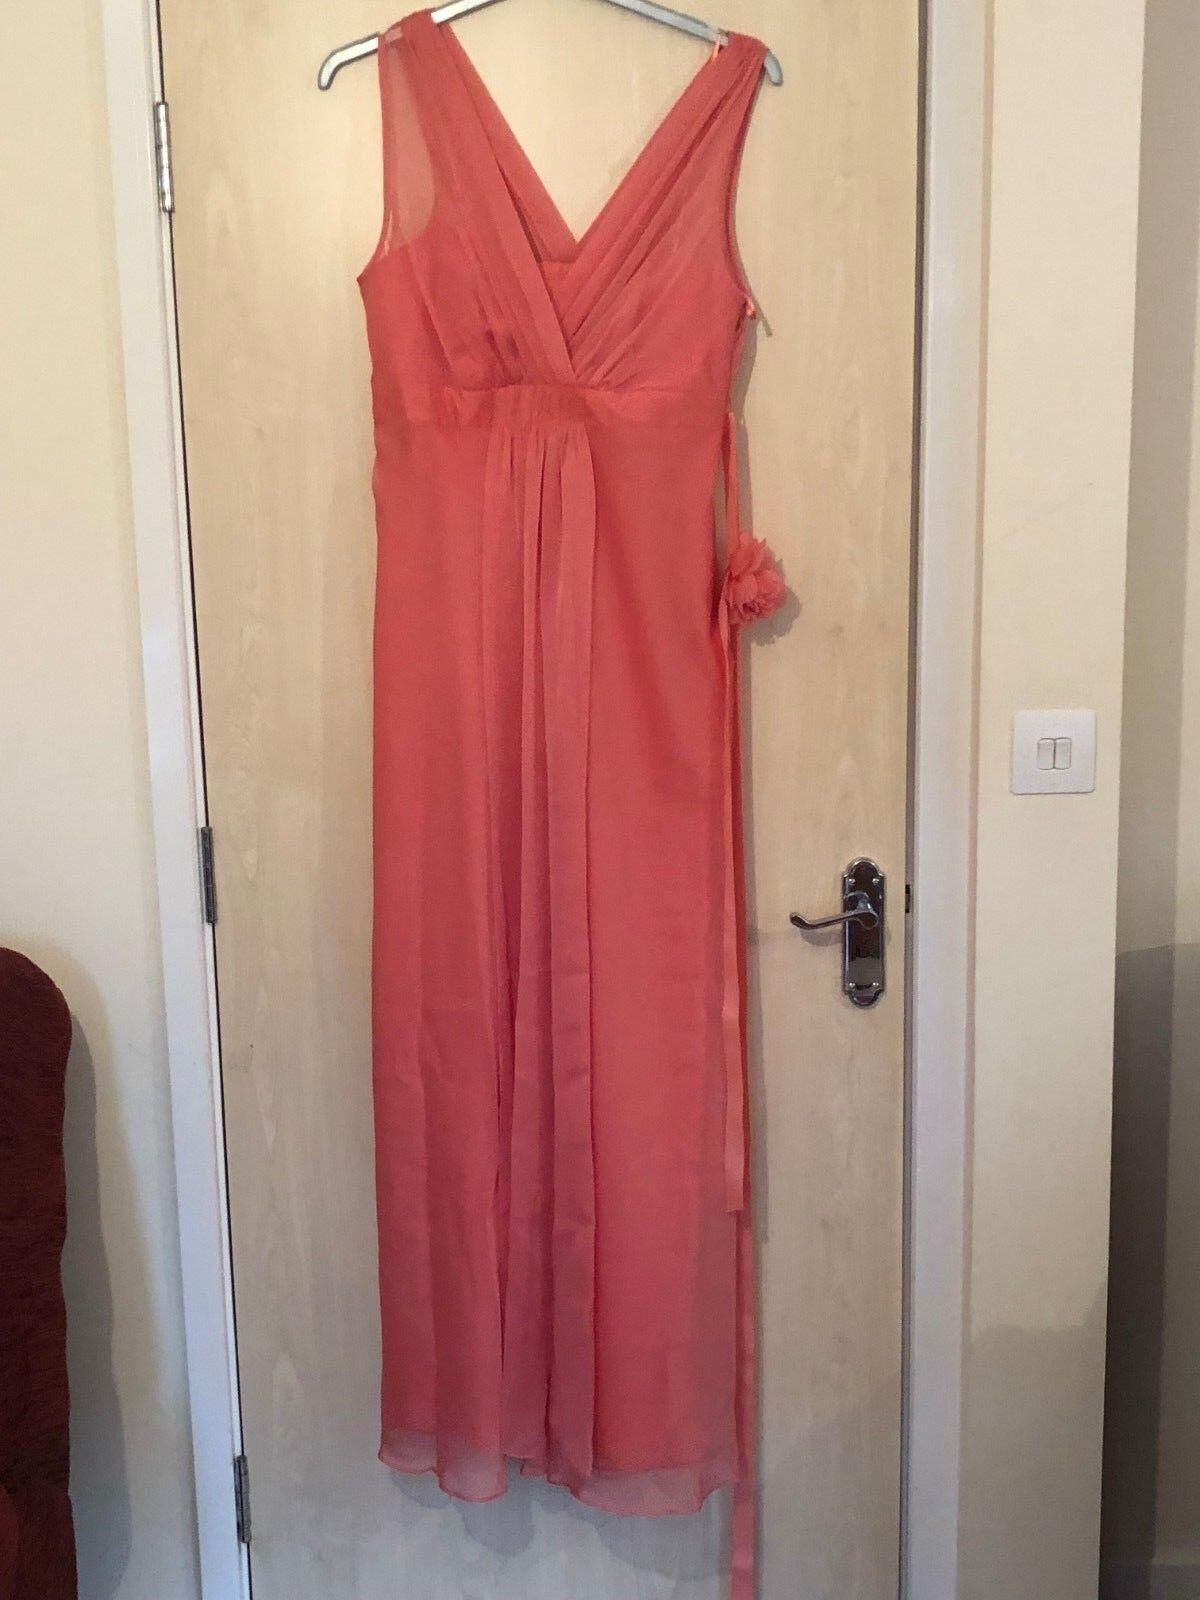 Women's dark peach dress from Debut in a size 16.